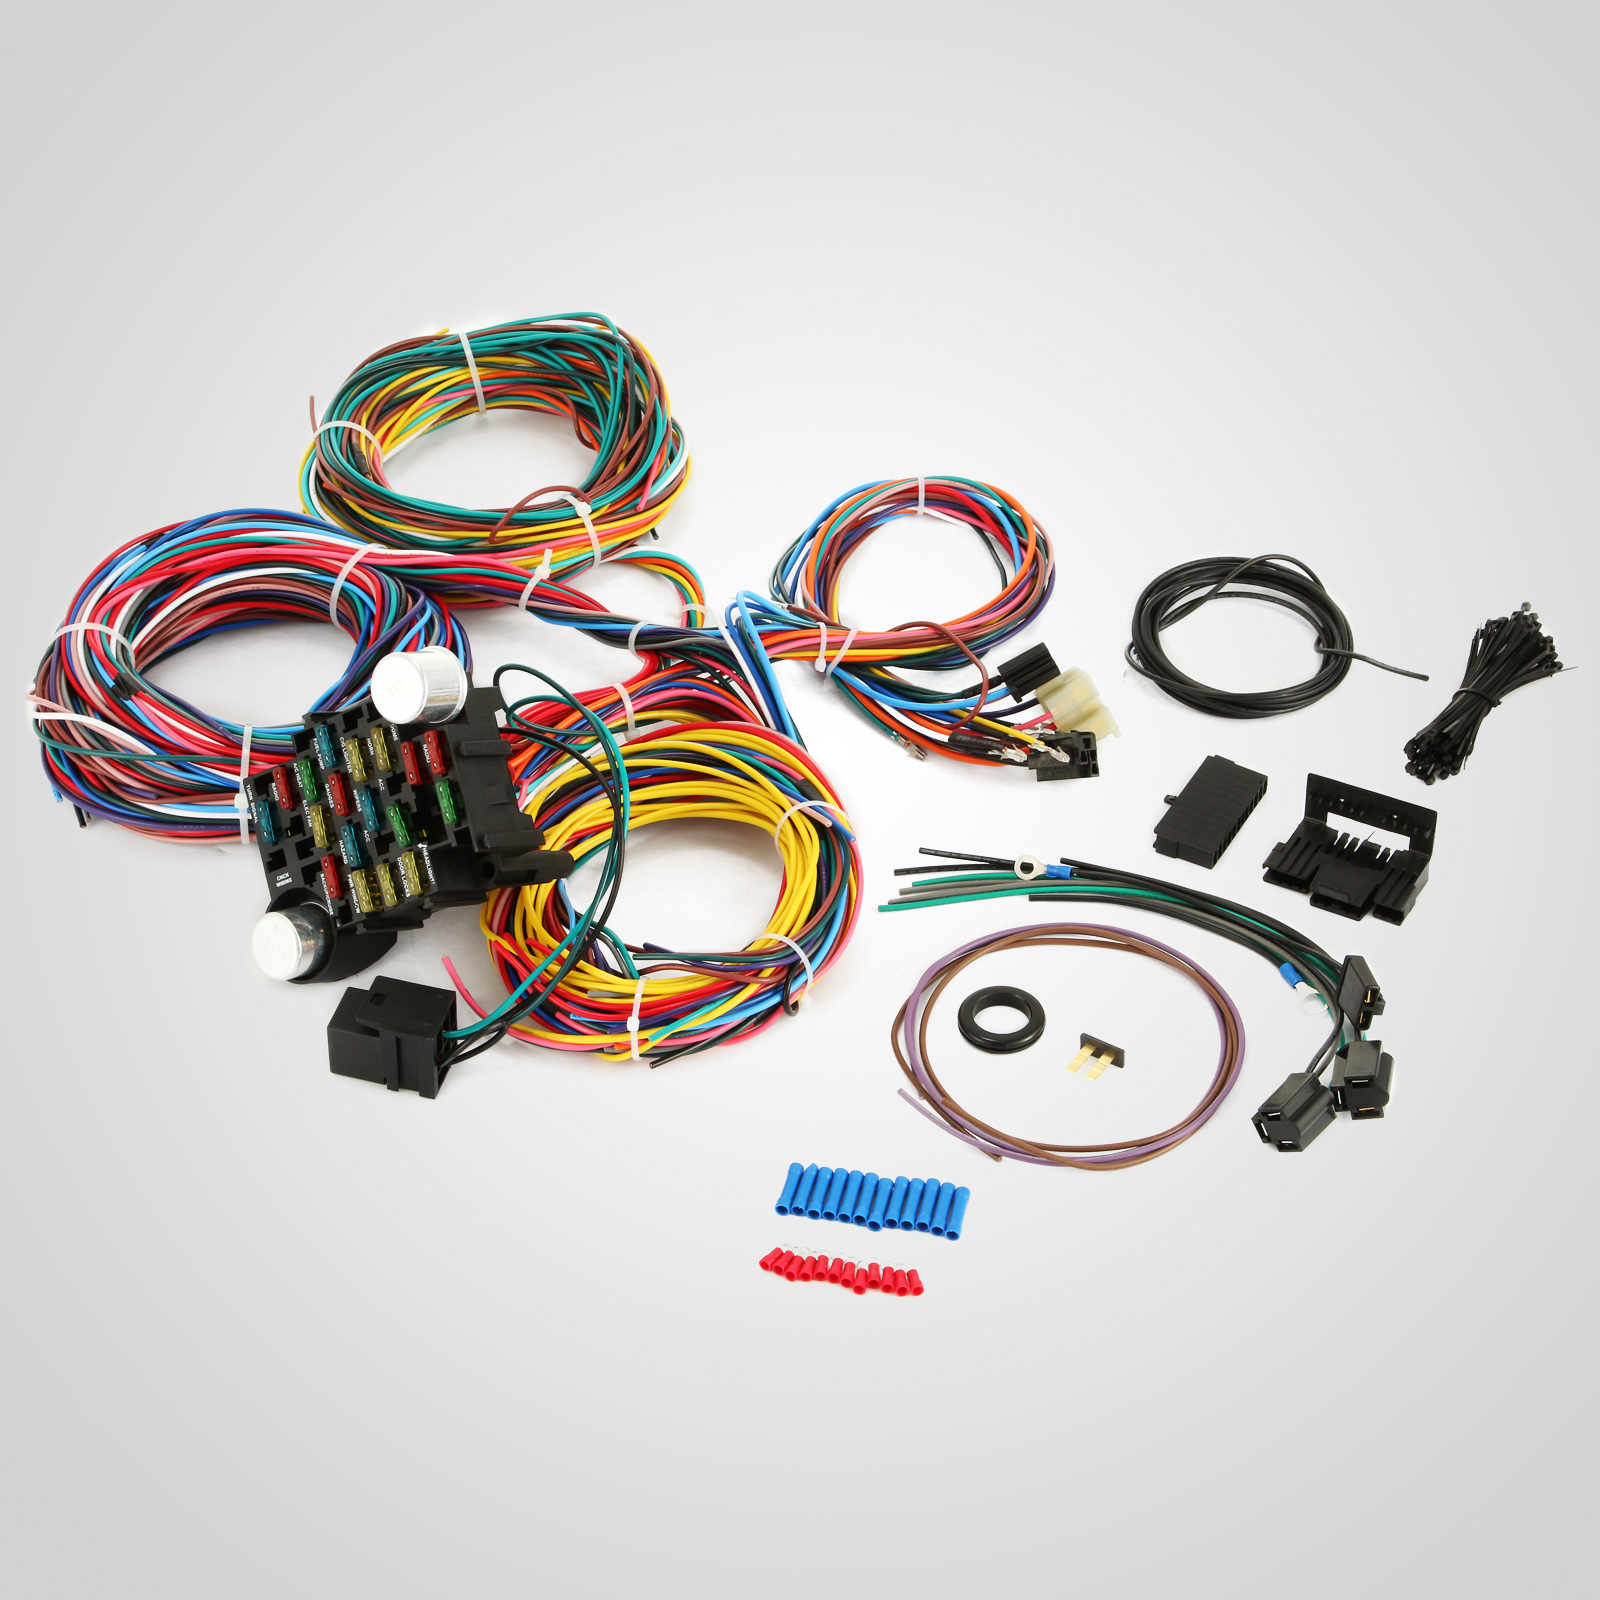 d127-2 Ez Wiring Horn Circuit on horn plugs, horn wire schematics, horn glass, horn cable, horn cabinets, horn design, horn relays,